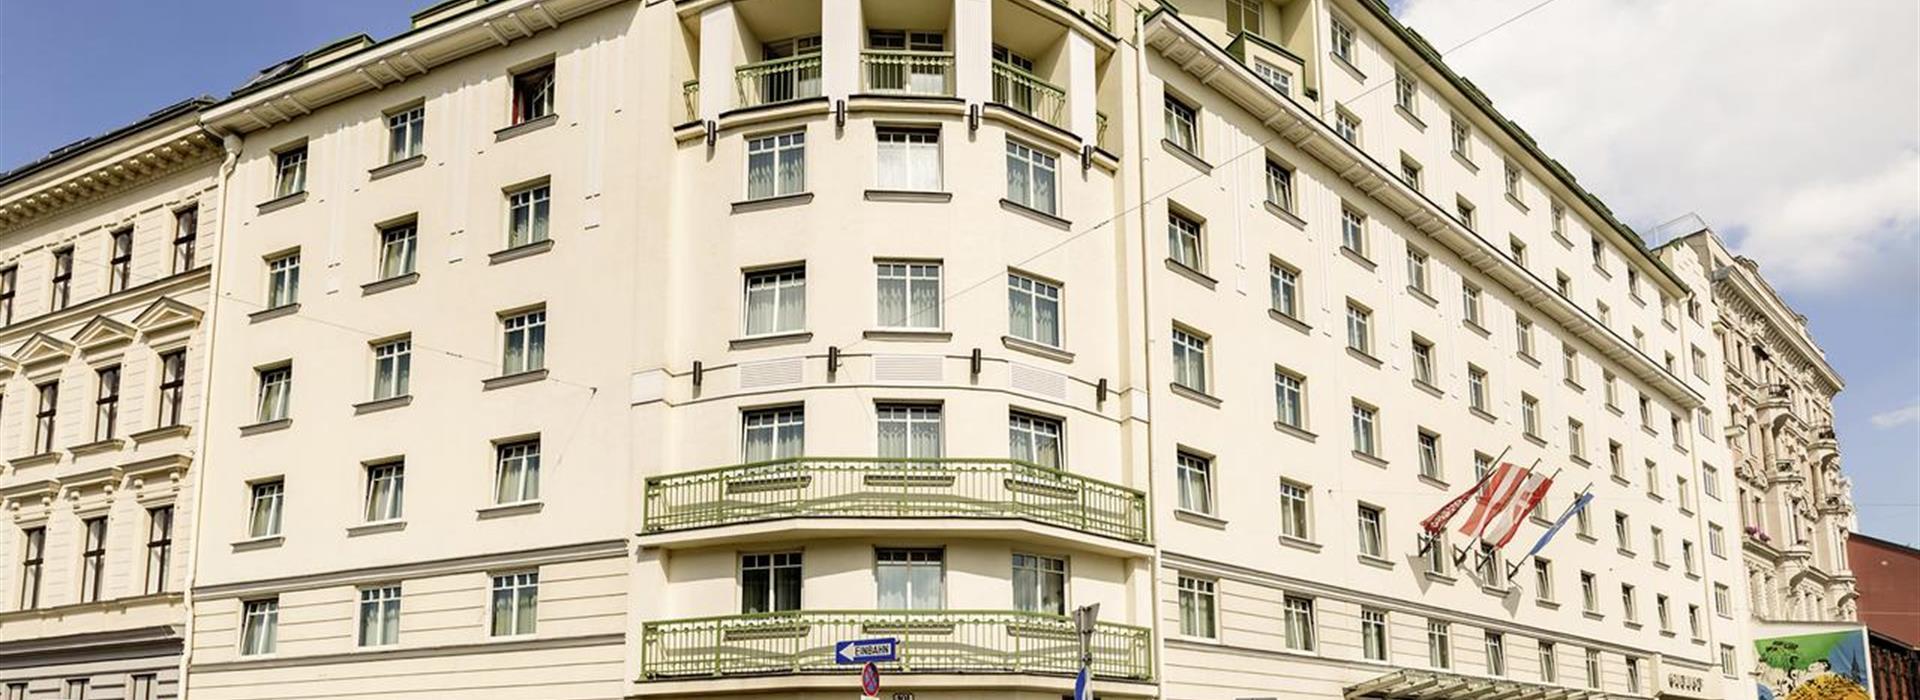 austria-trend-hotel-ananas-wien